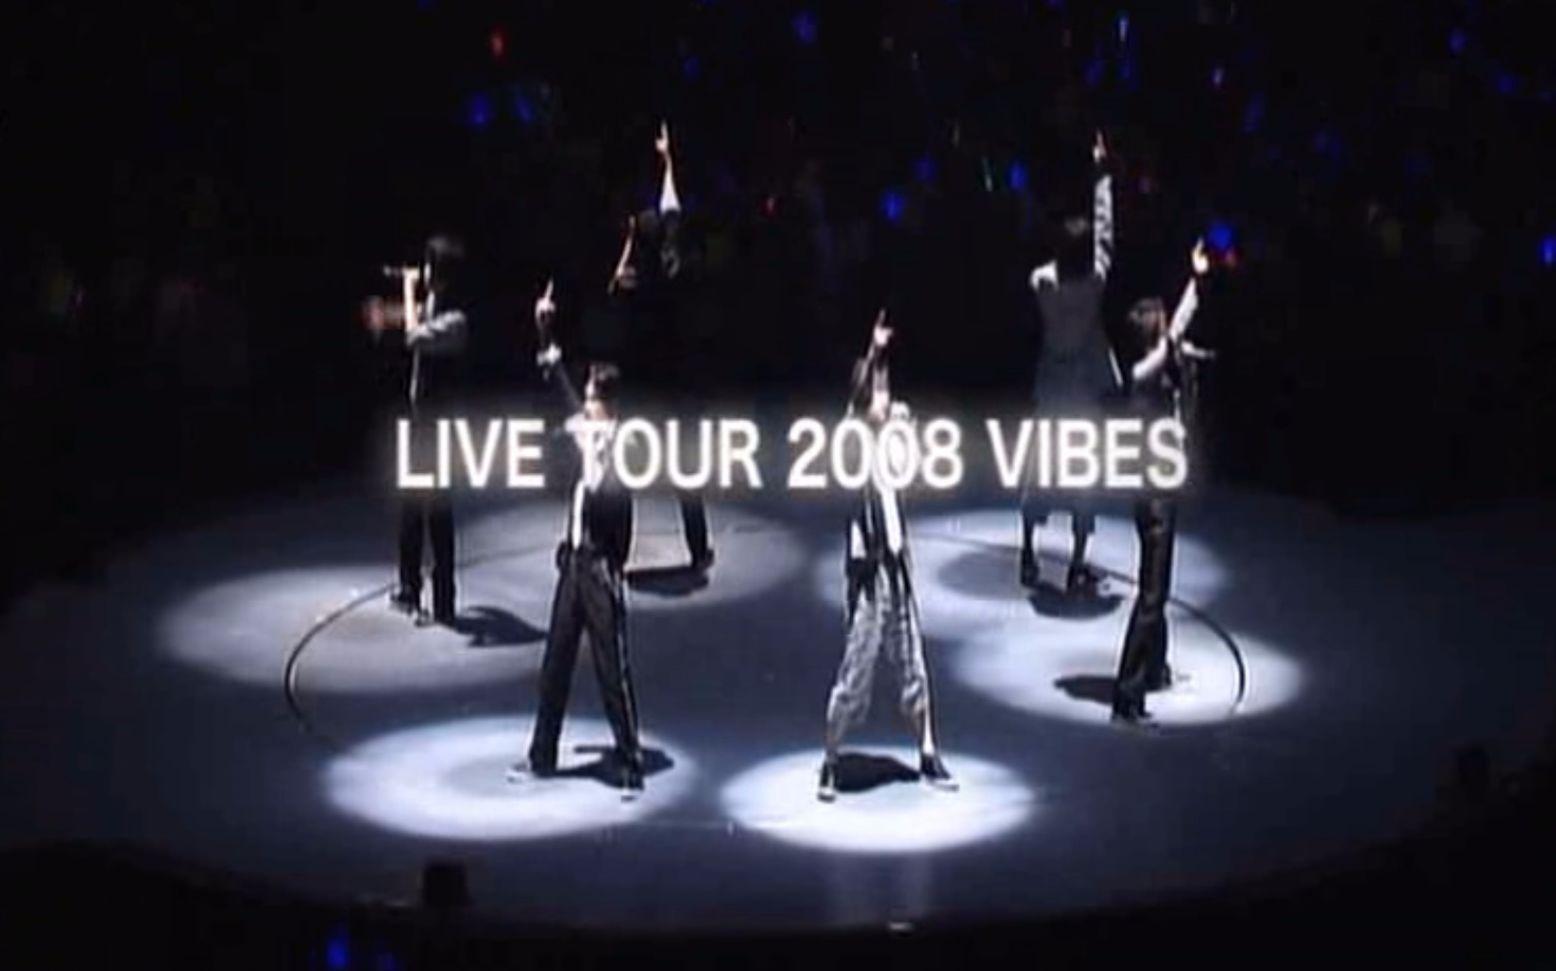 【V6】LIVE TOUR 2008 VIBES 特典映像[BGS字幕組] MC+携帶待受畵面+Special